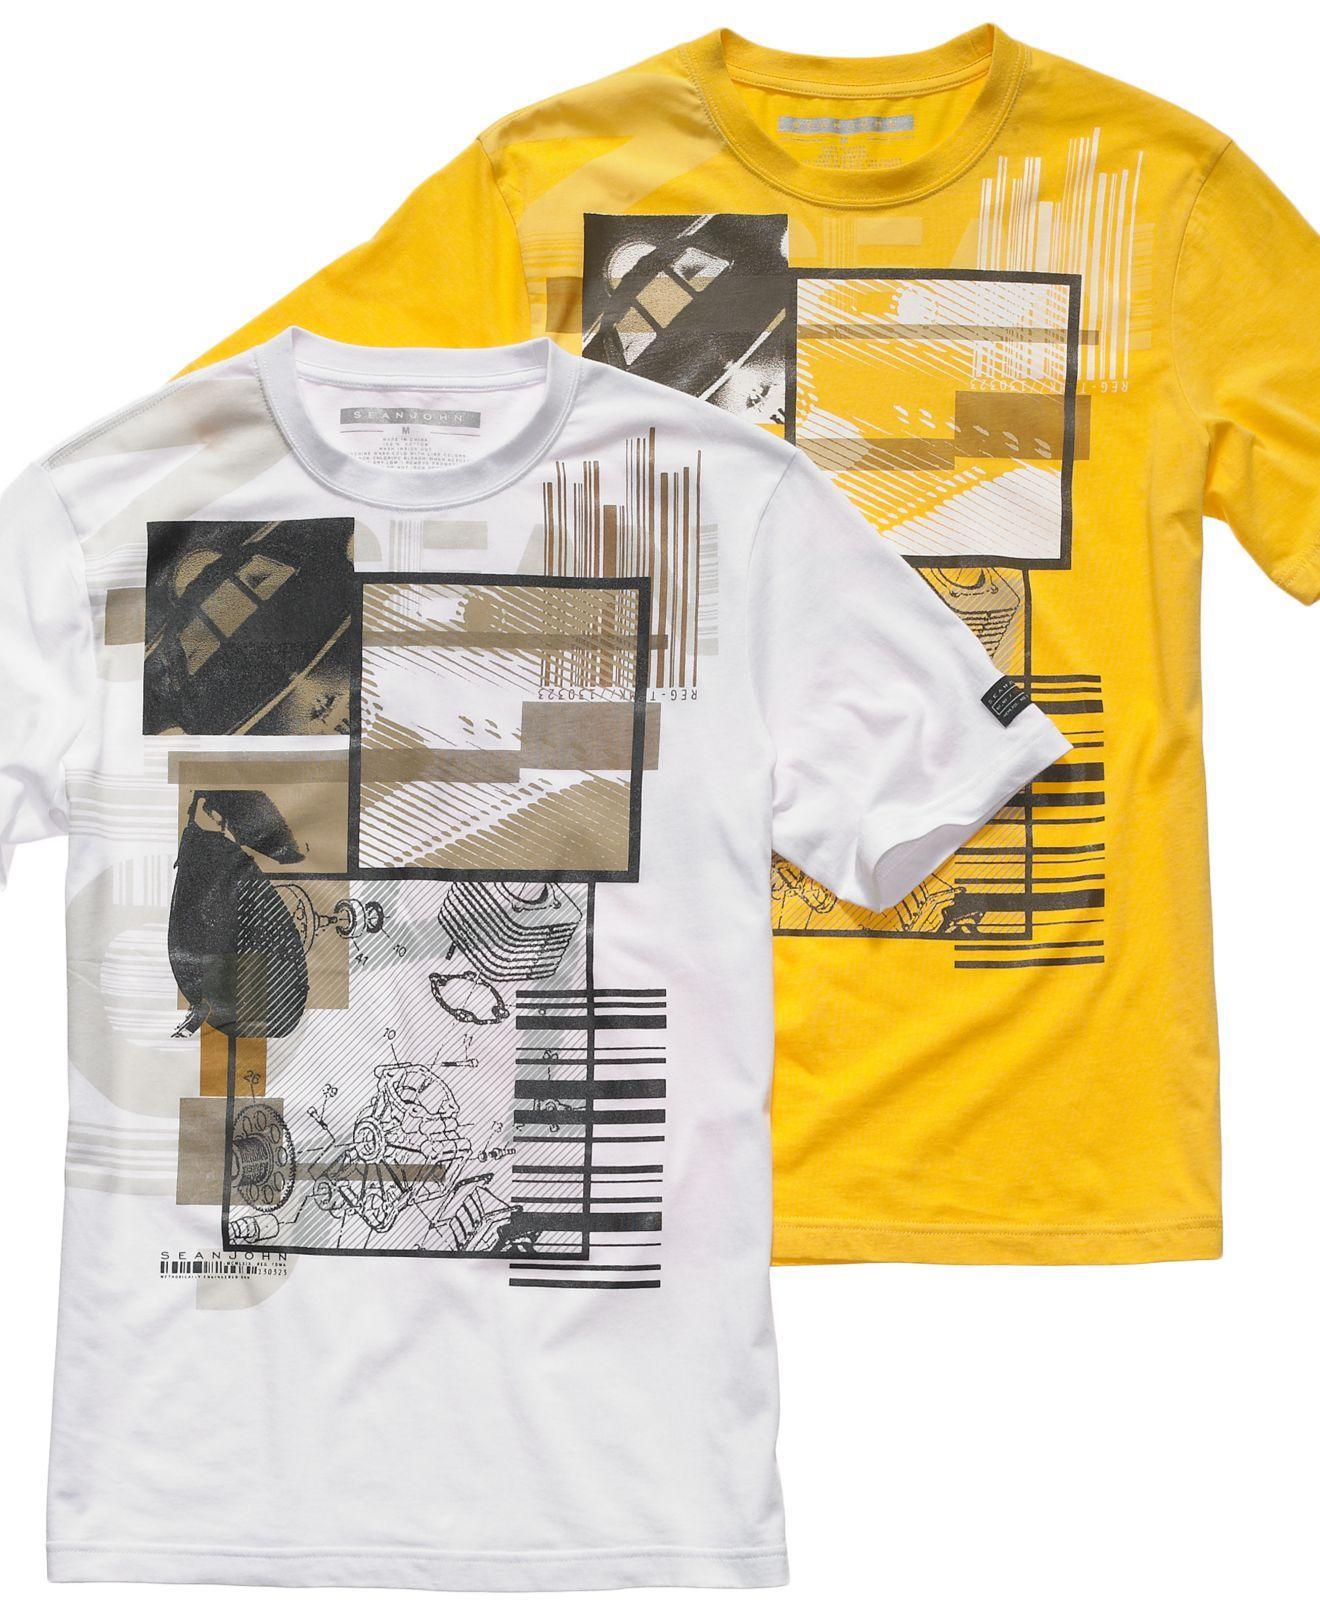 Sean john shirt winning t shirt mens polos t shirts for Sean john t shirts for mens